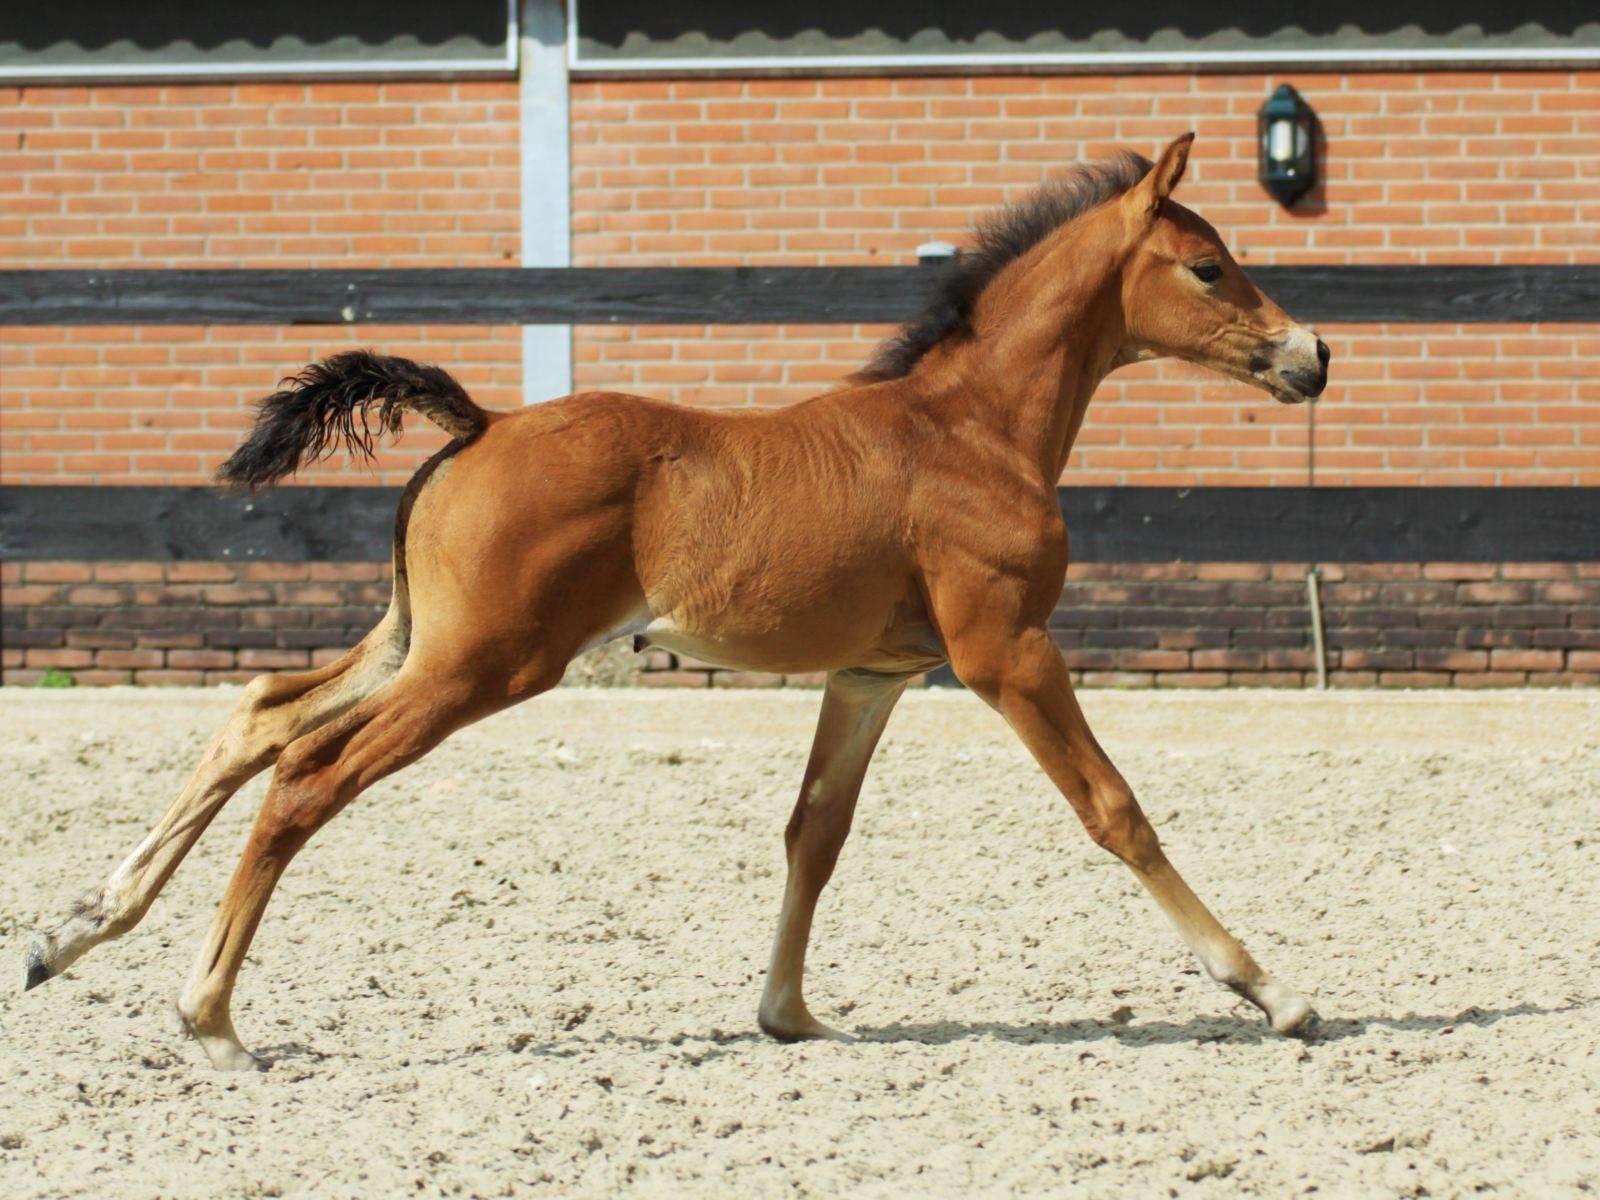 Young Horses Foals New York